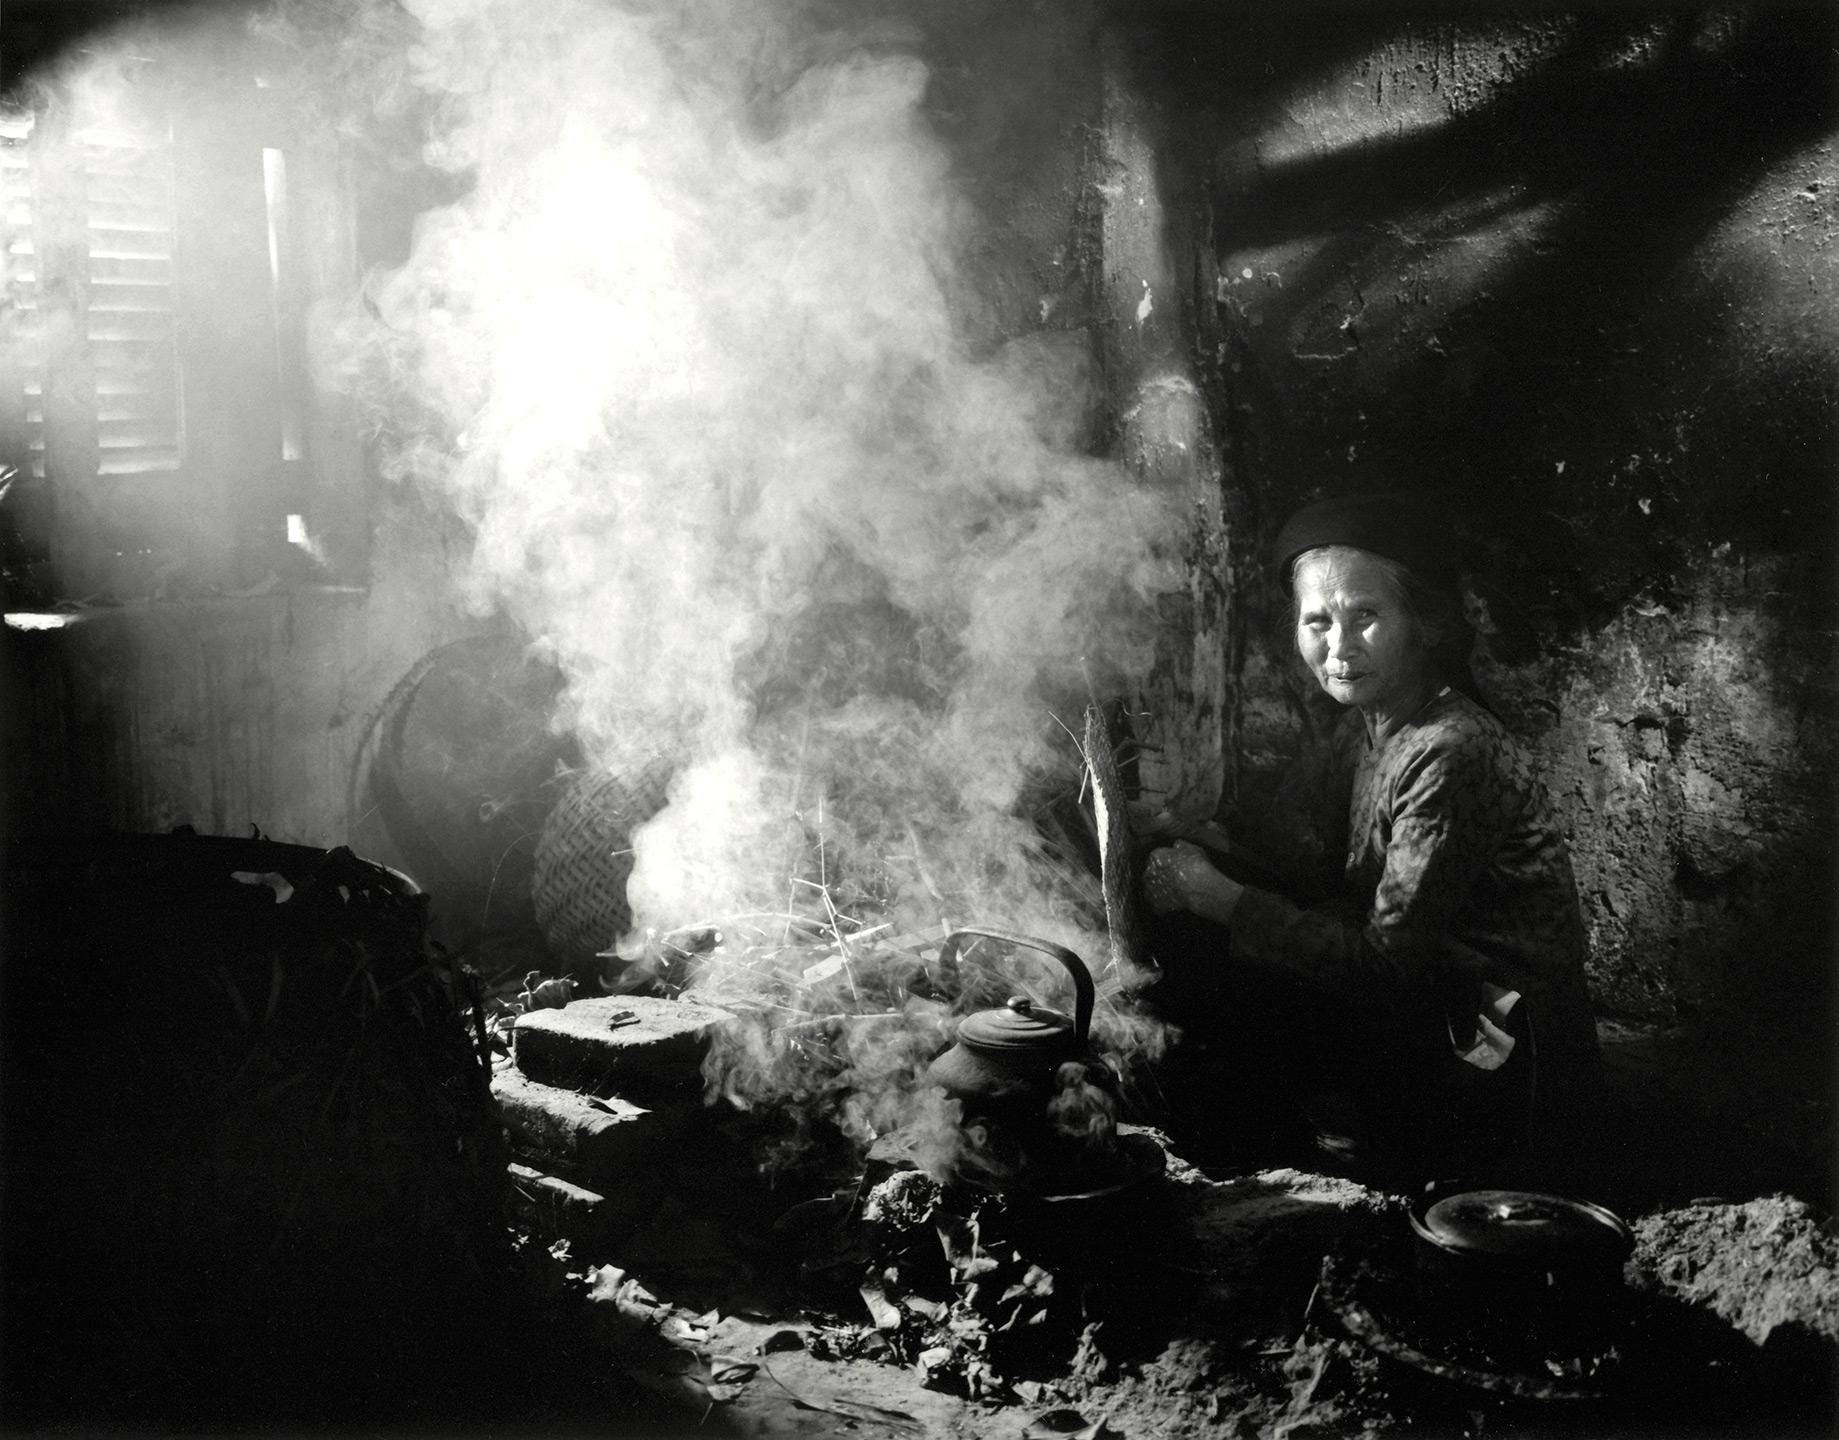 Le-Thi-Thao-1994-1.jpg